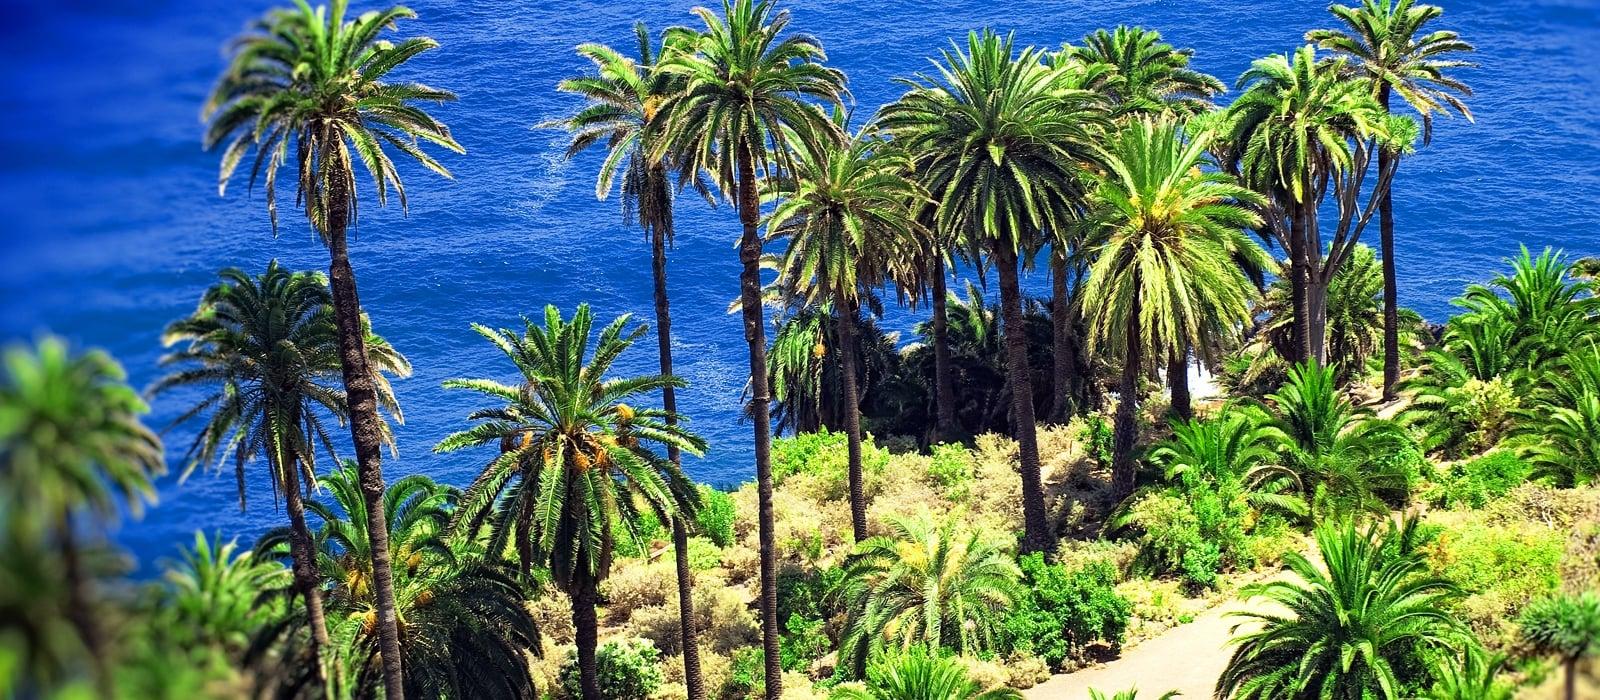 Tenerife - Vincci Hoteles